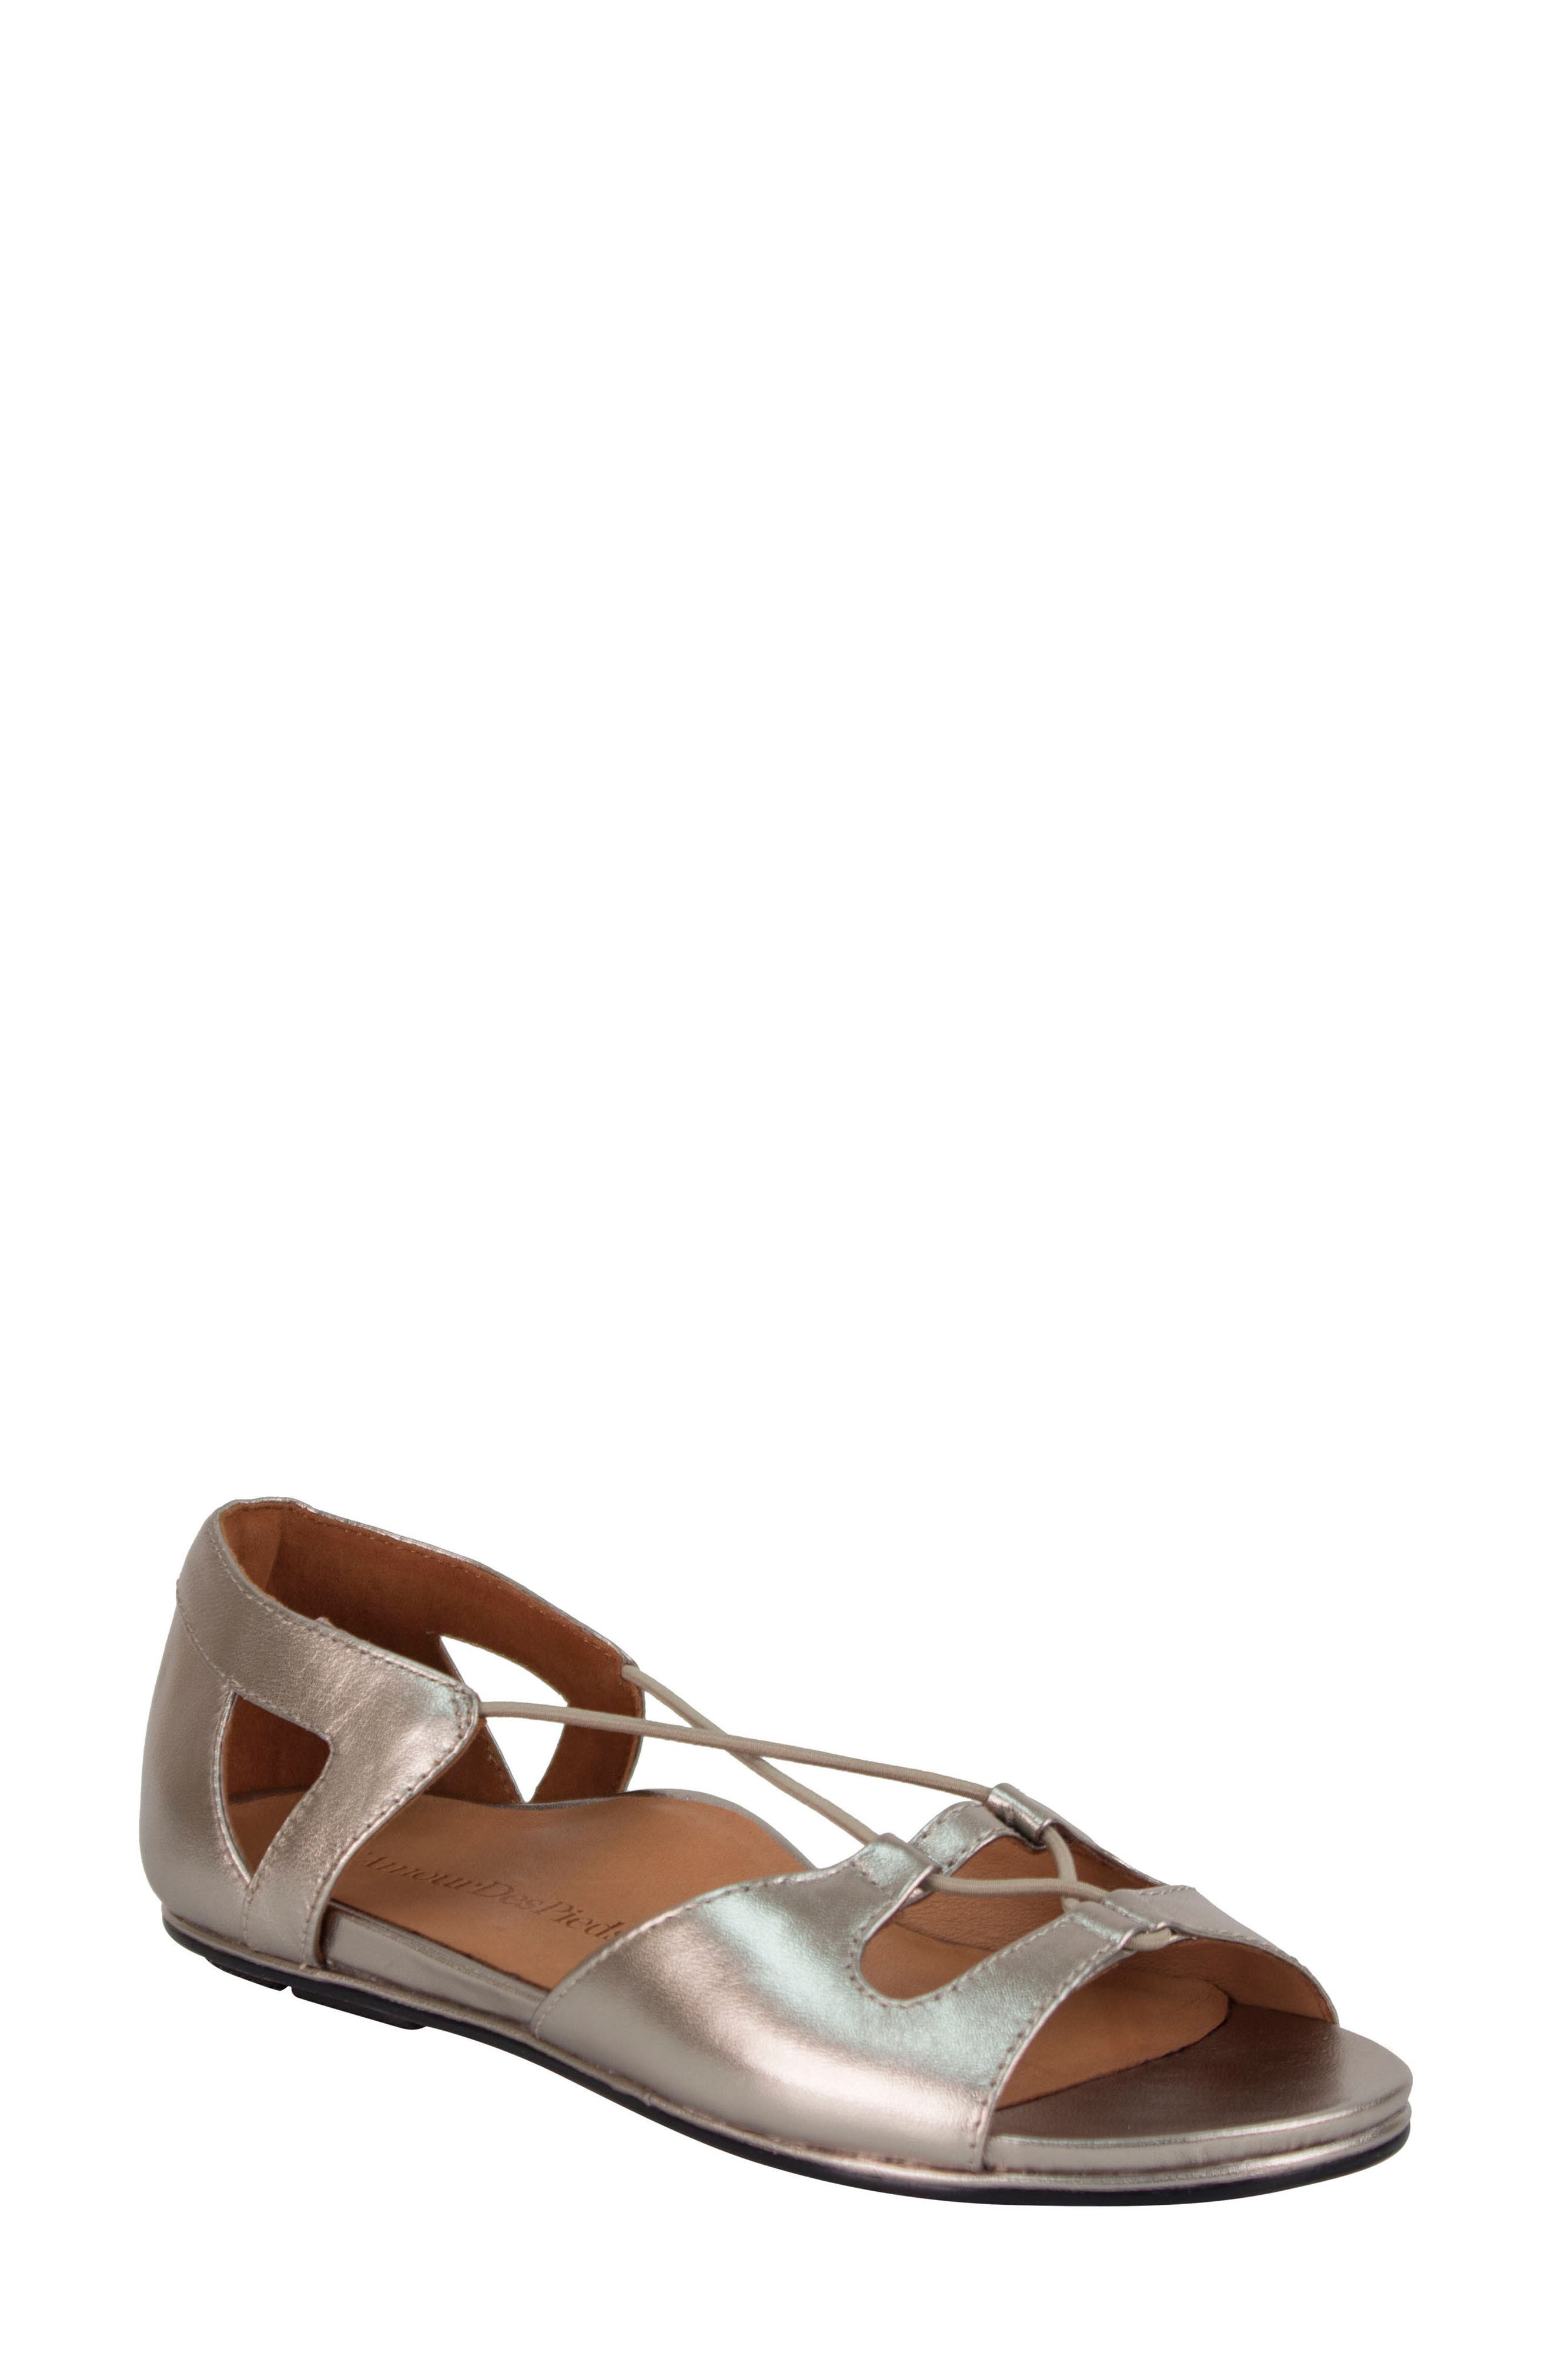 'Darron' Sandal,                             Main thumbnail 1, color,                             Pewter Leather